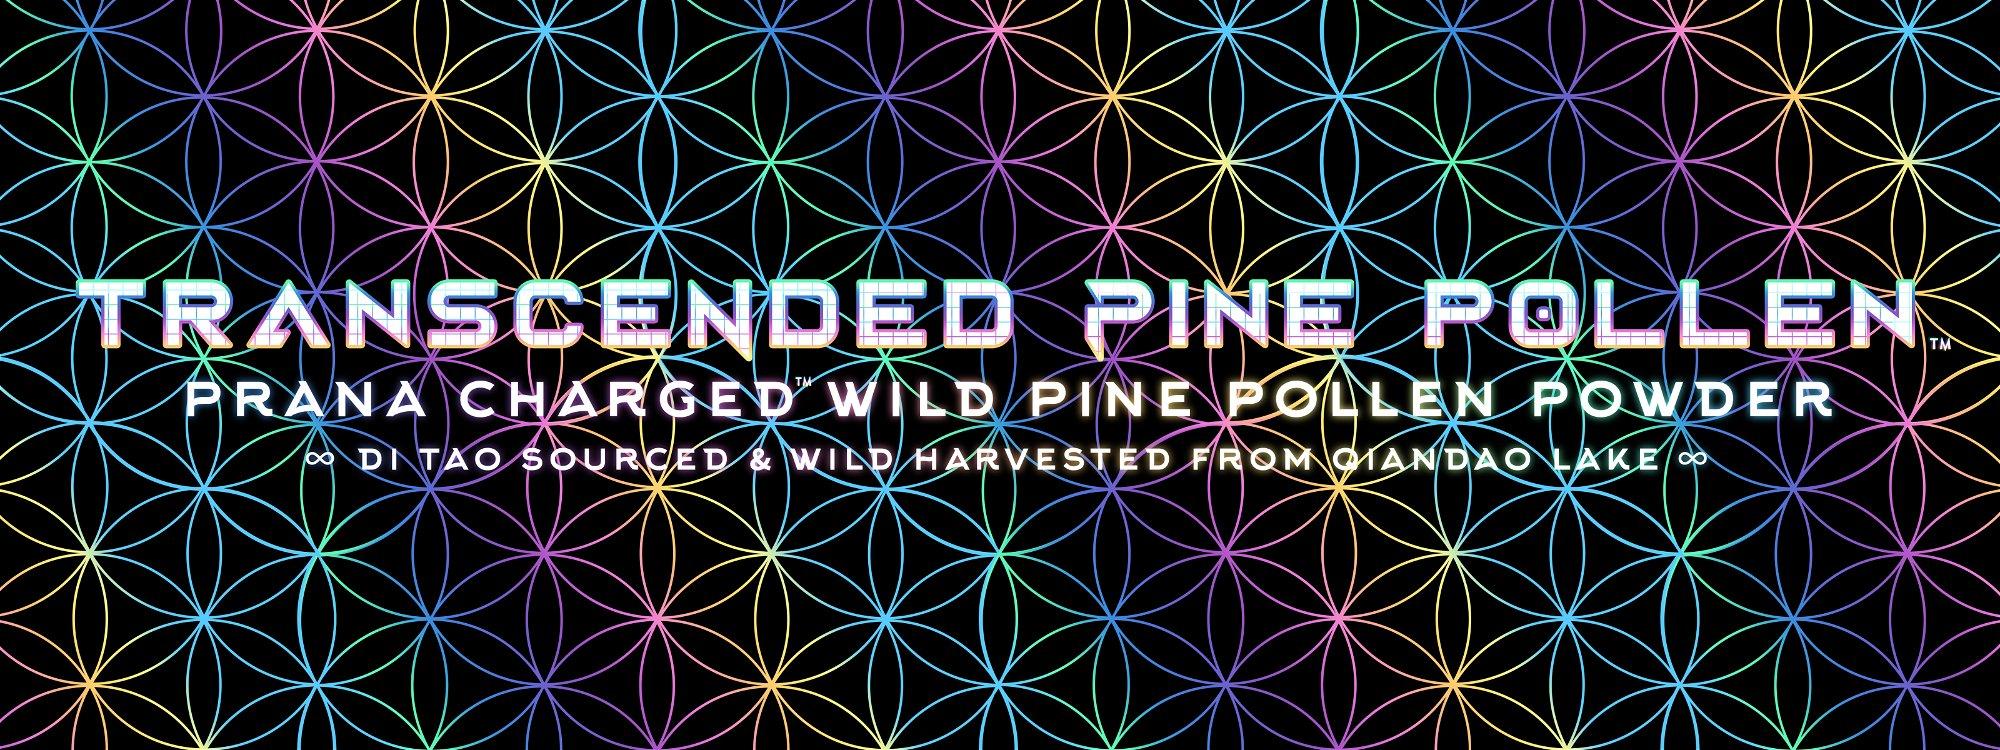 transcended pine pollen di tao sourced qiandao lake